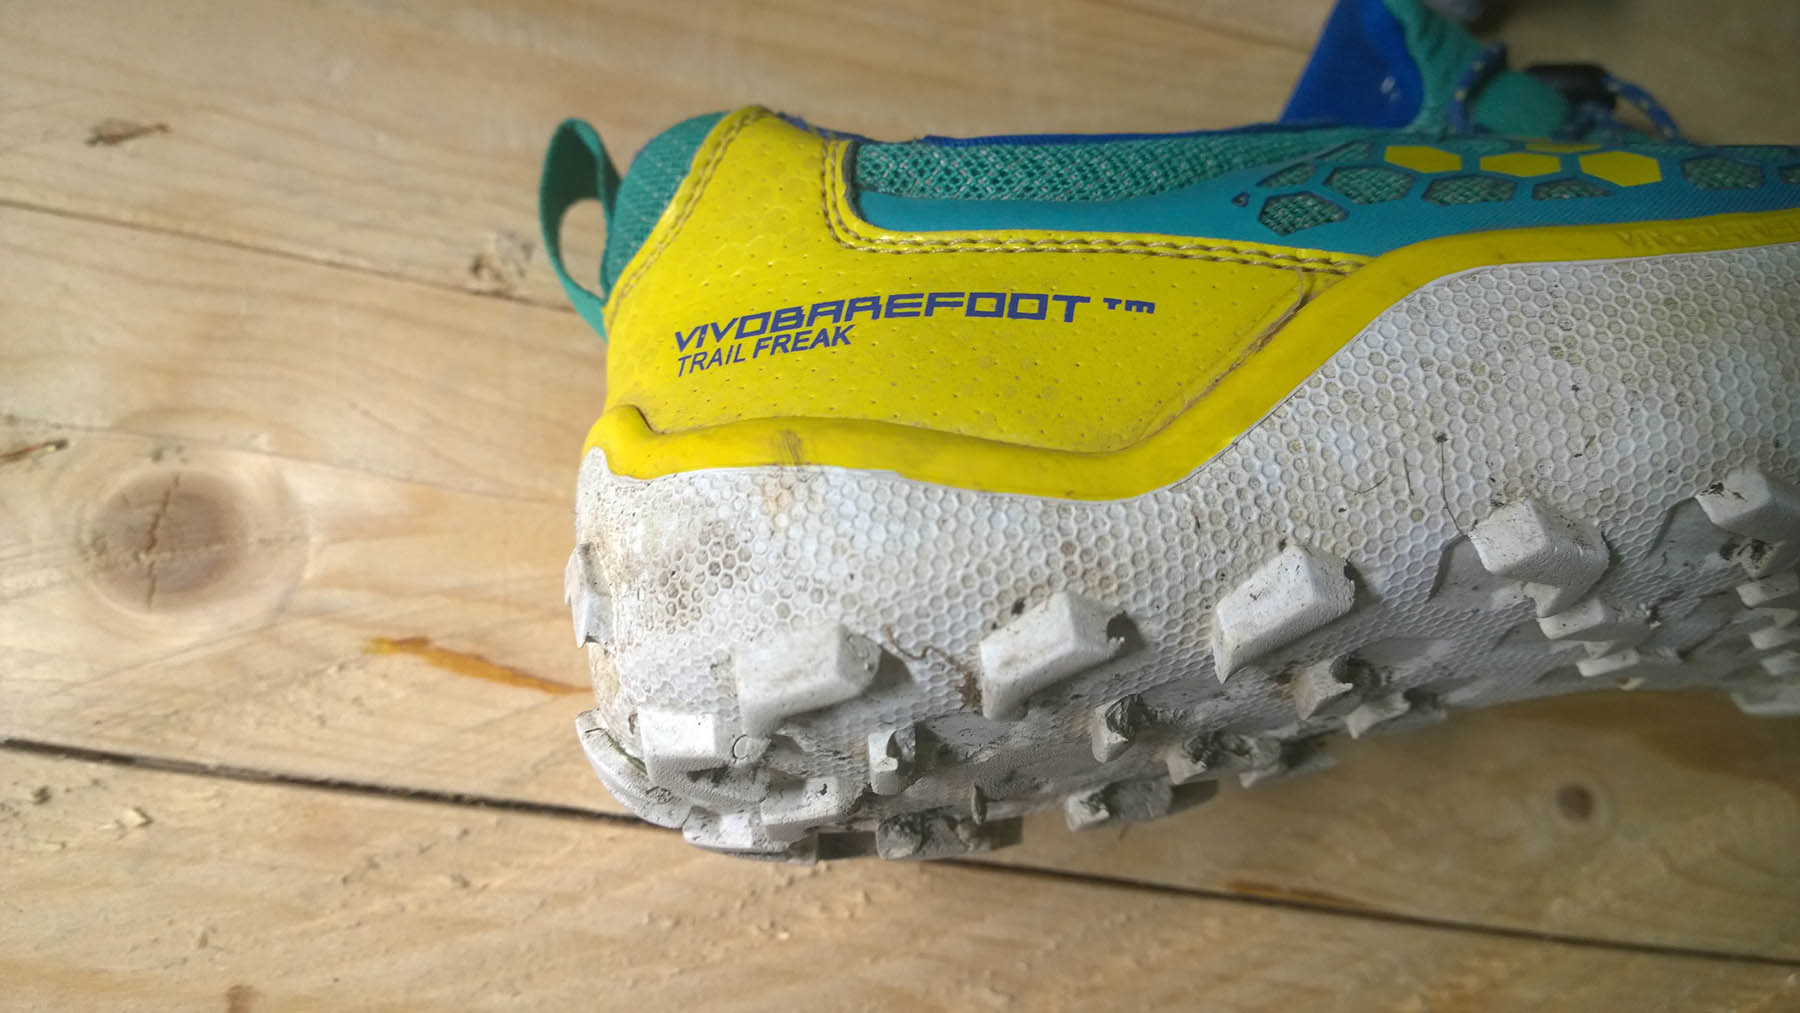 Robustná, dobre chránená päta barefoot tenisiek Trail Freak